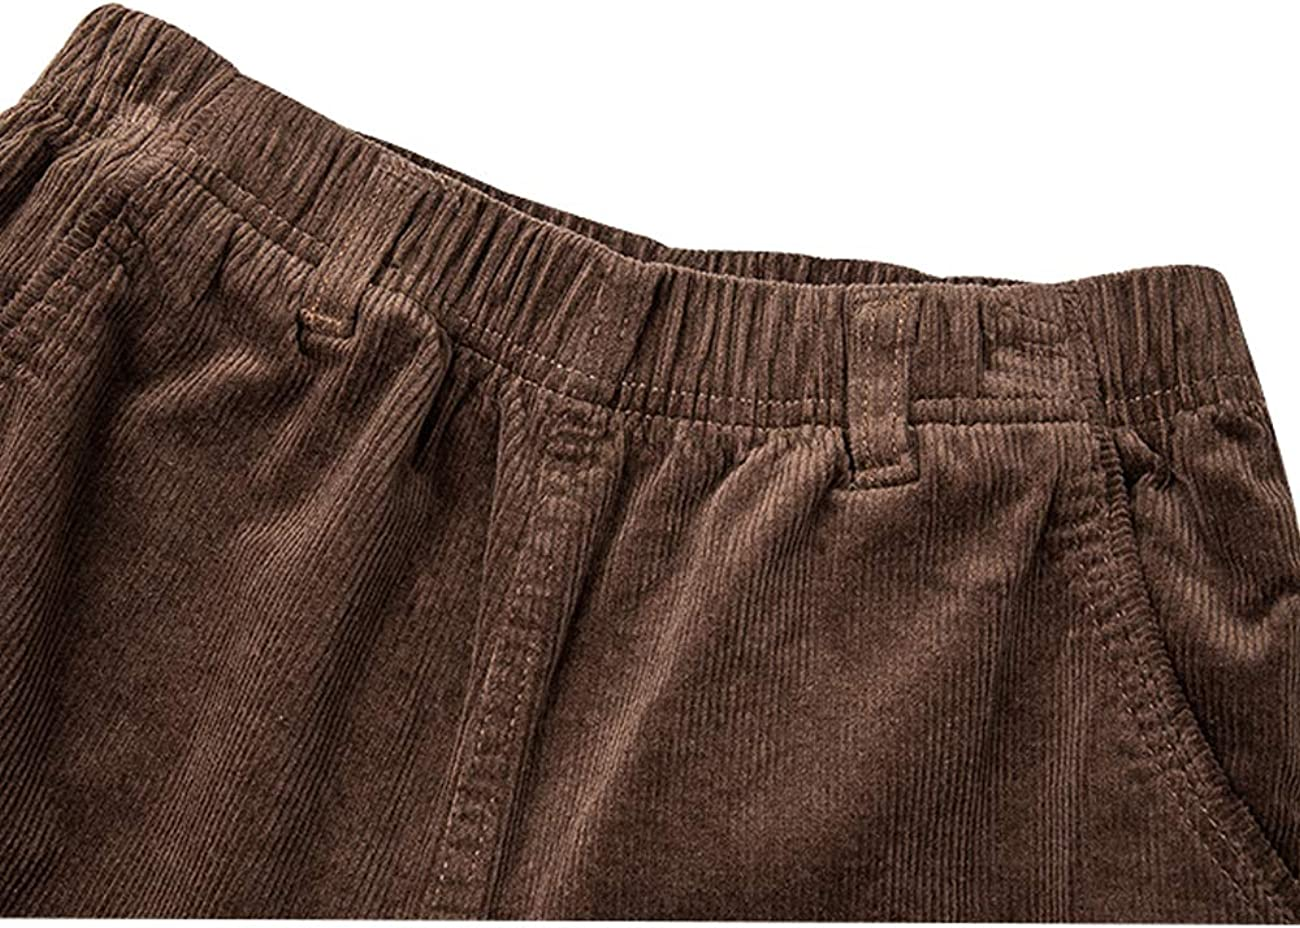 Bigassets Women's Elastic Waist Straight Trousers Corduroy Pants Khaki